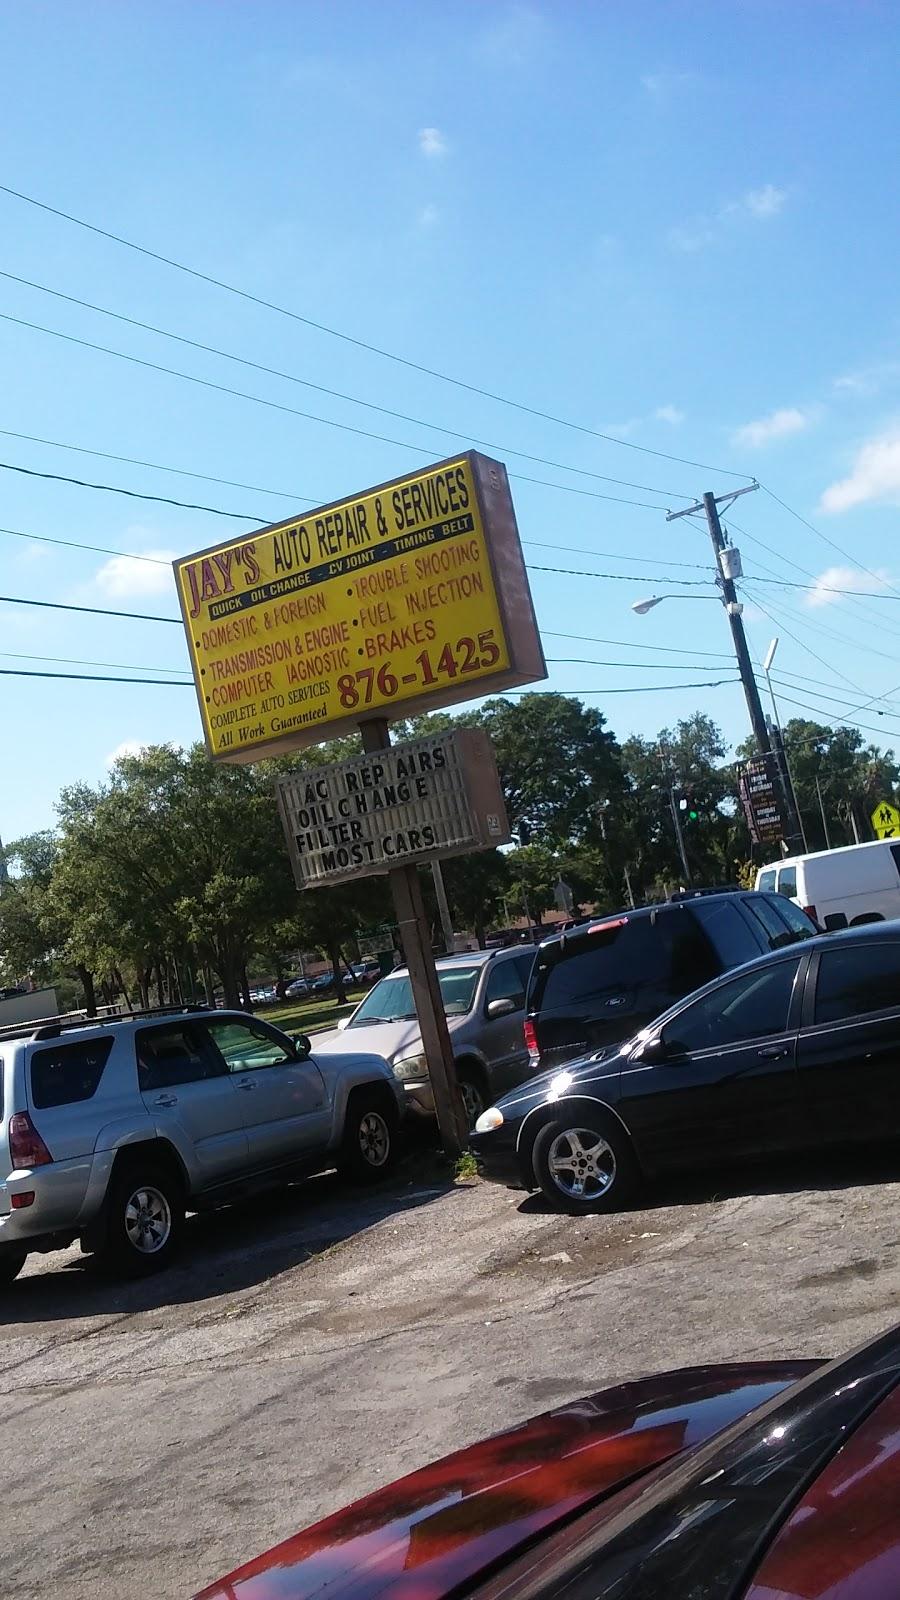 Jays Auto Repair - car repair    Photo 2 of 4   Address: 6326 N Armenia Ave, Tampa, FL 33604, USA   Phone: (813) 876-1425